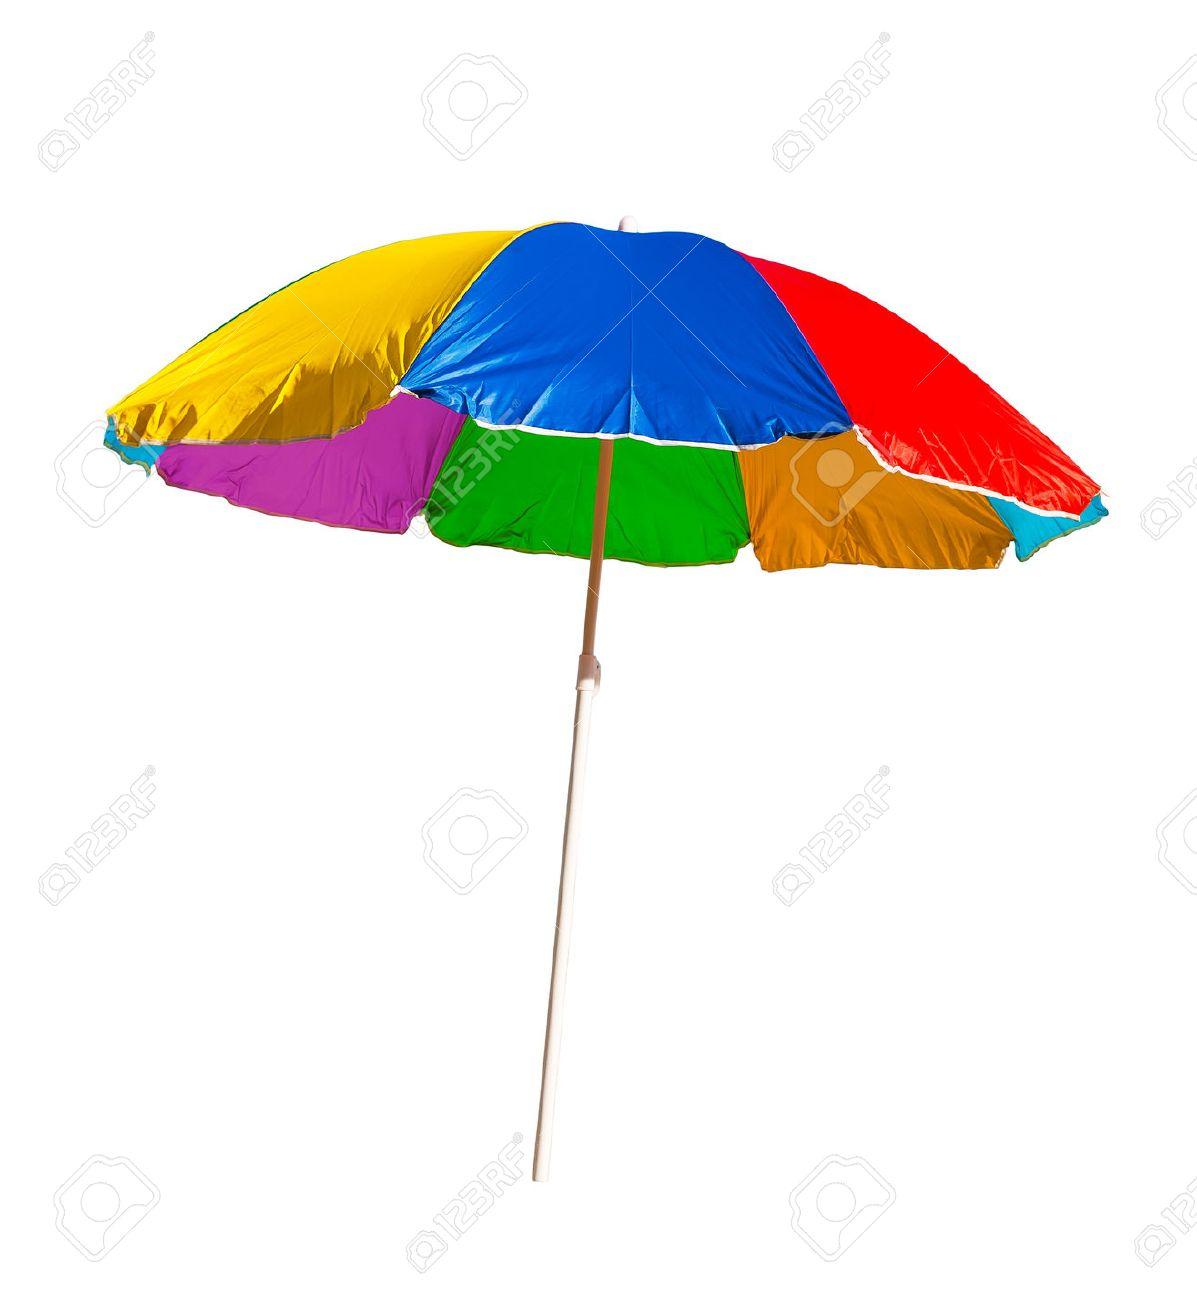 beach umbrella isolated on a white background - 41758436